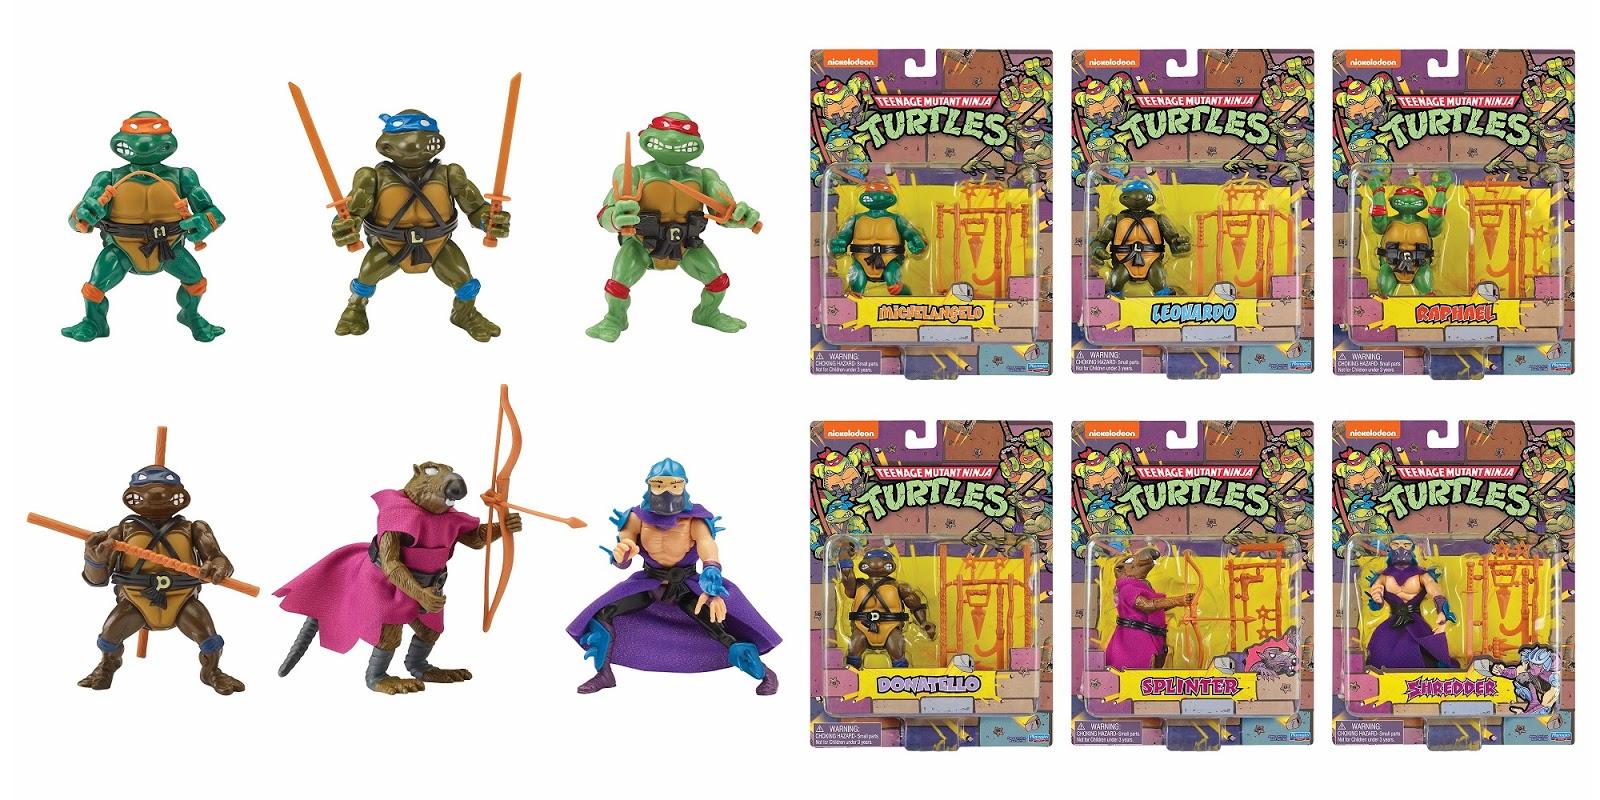 The Blot Says Sdcc 2020 Exclusive Teenage Mutant Ninja Turtles Retro Rotocast Action Figure Set By Playmates